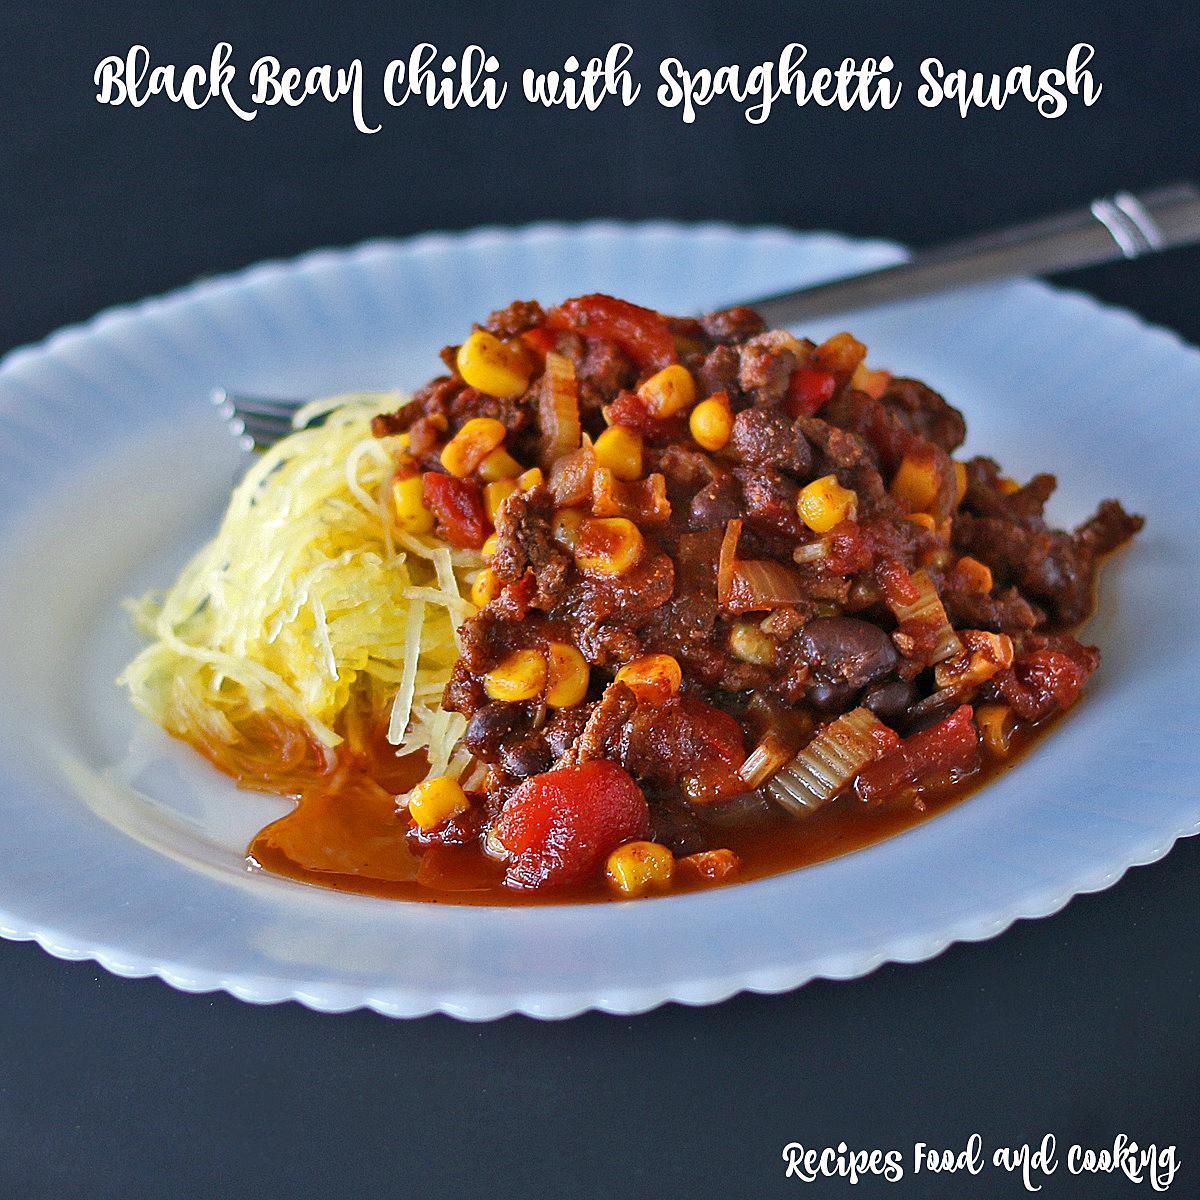 Black Bean Chili with Spaghetti Squash